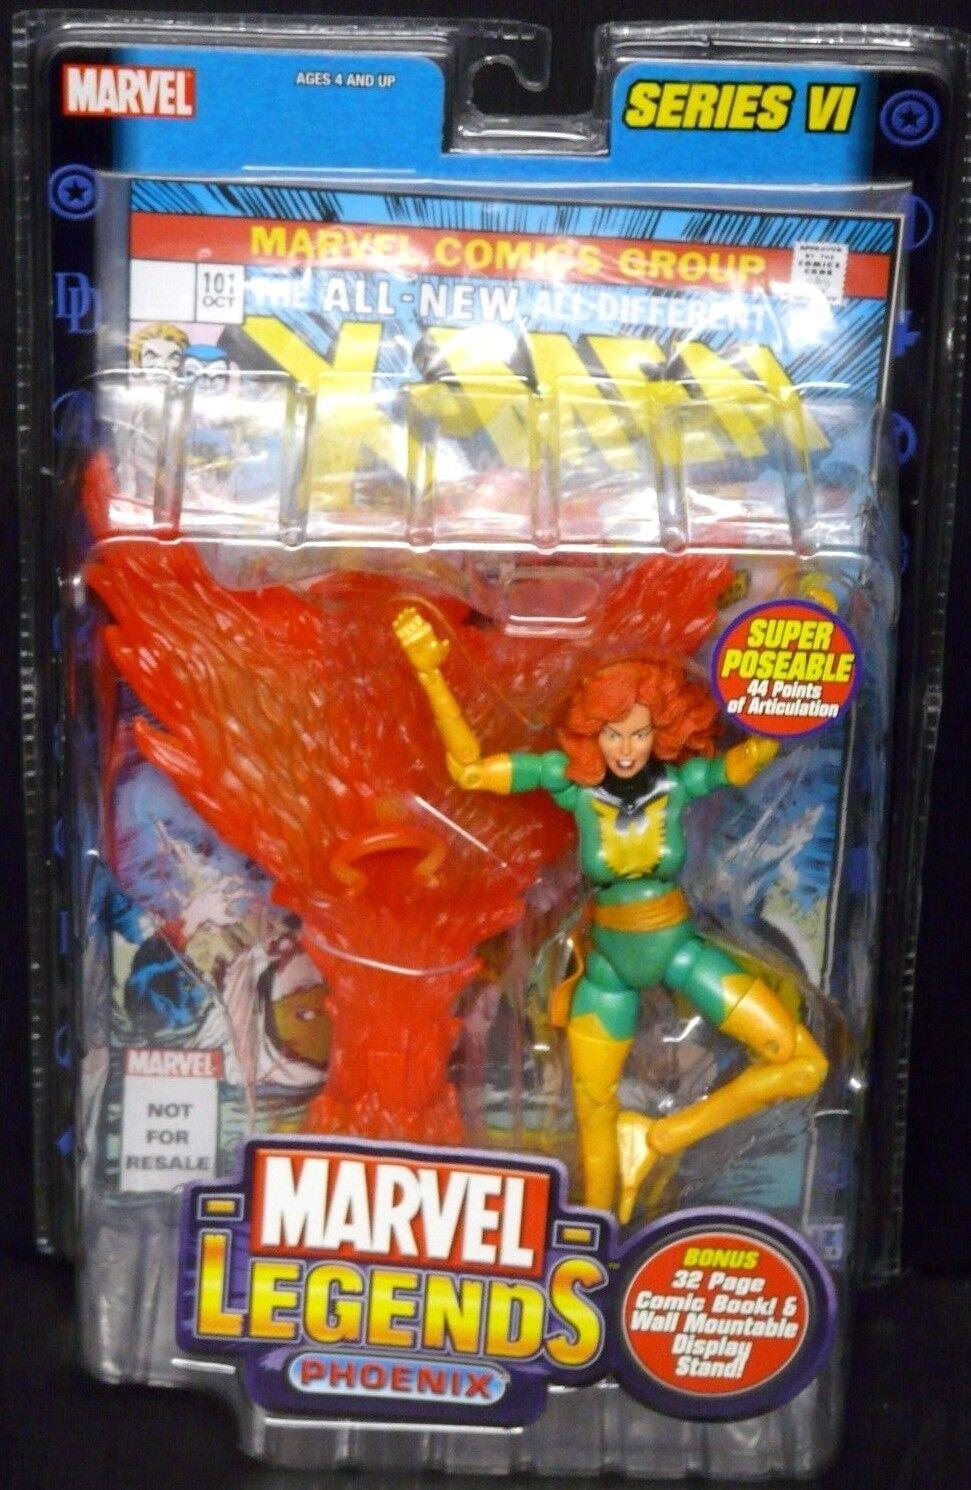 Marvel Legends Series VI (6) PHOENIX New  Rare  X-Men Jean grau